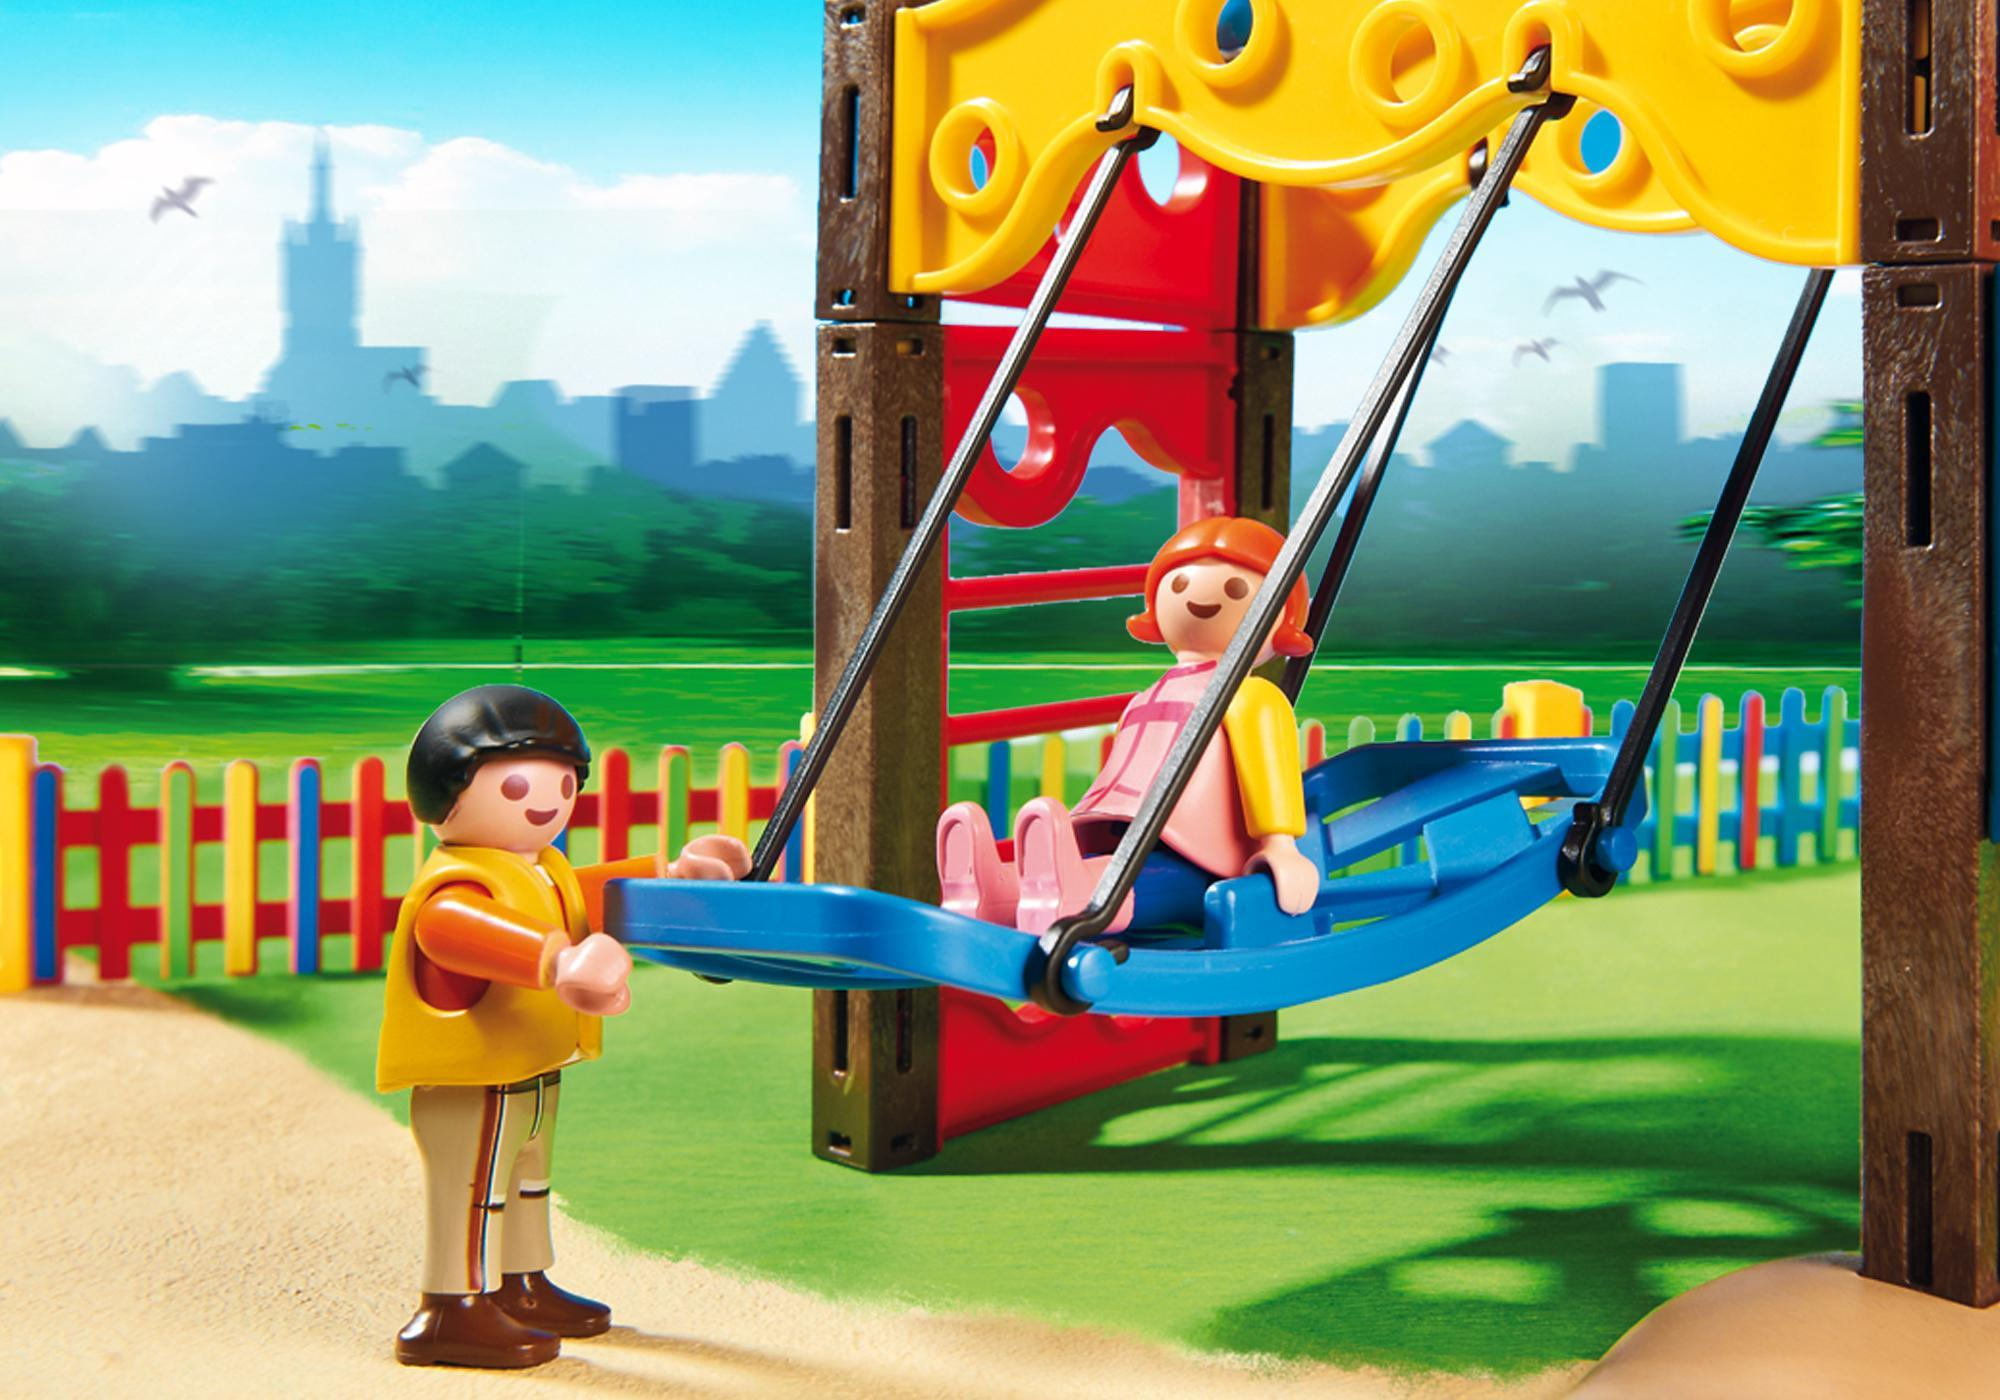 http://media.playmobil.com/i/playmobil/5568_product_extra3/Kinderspielplatz